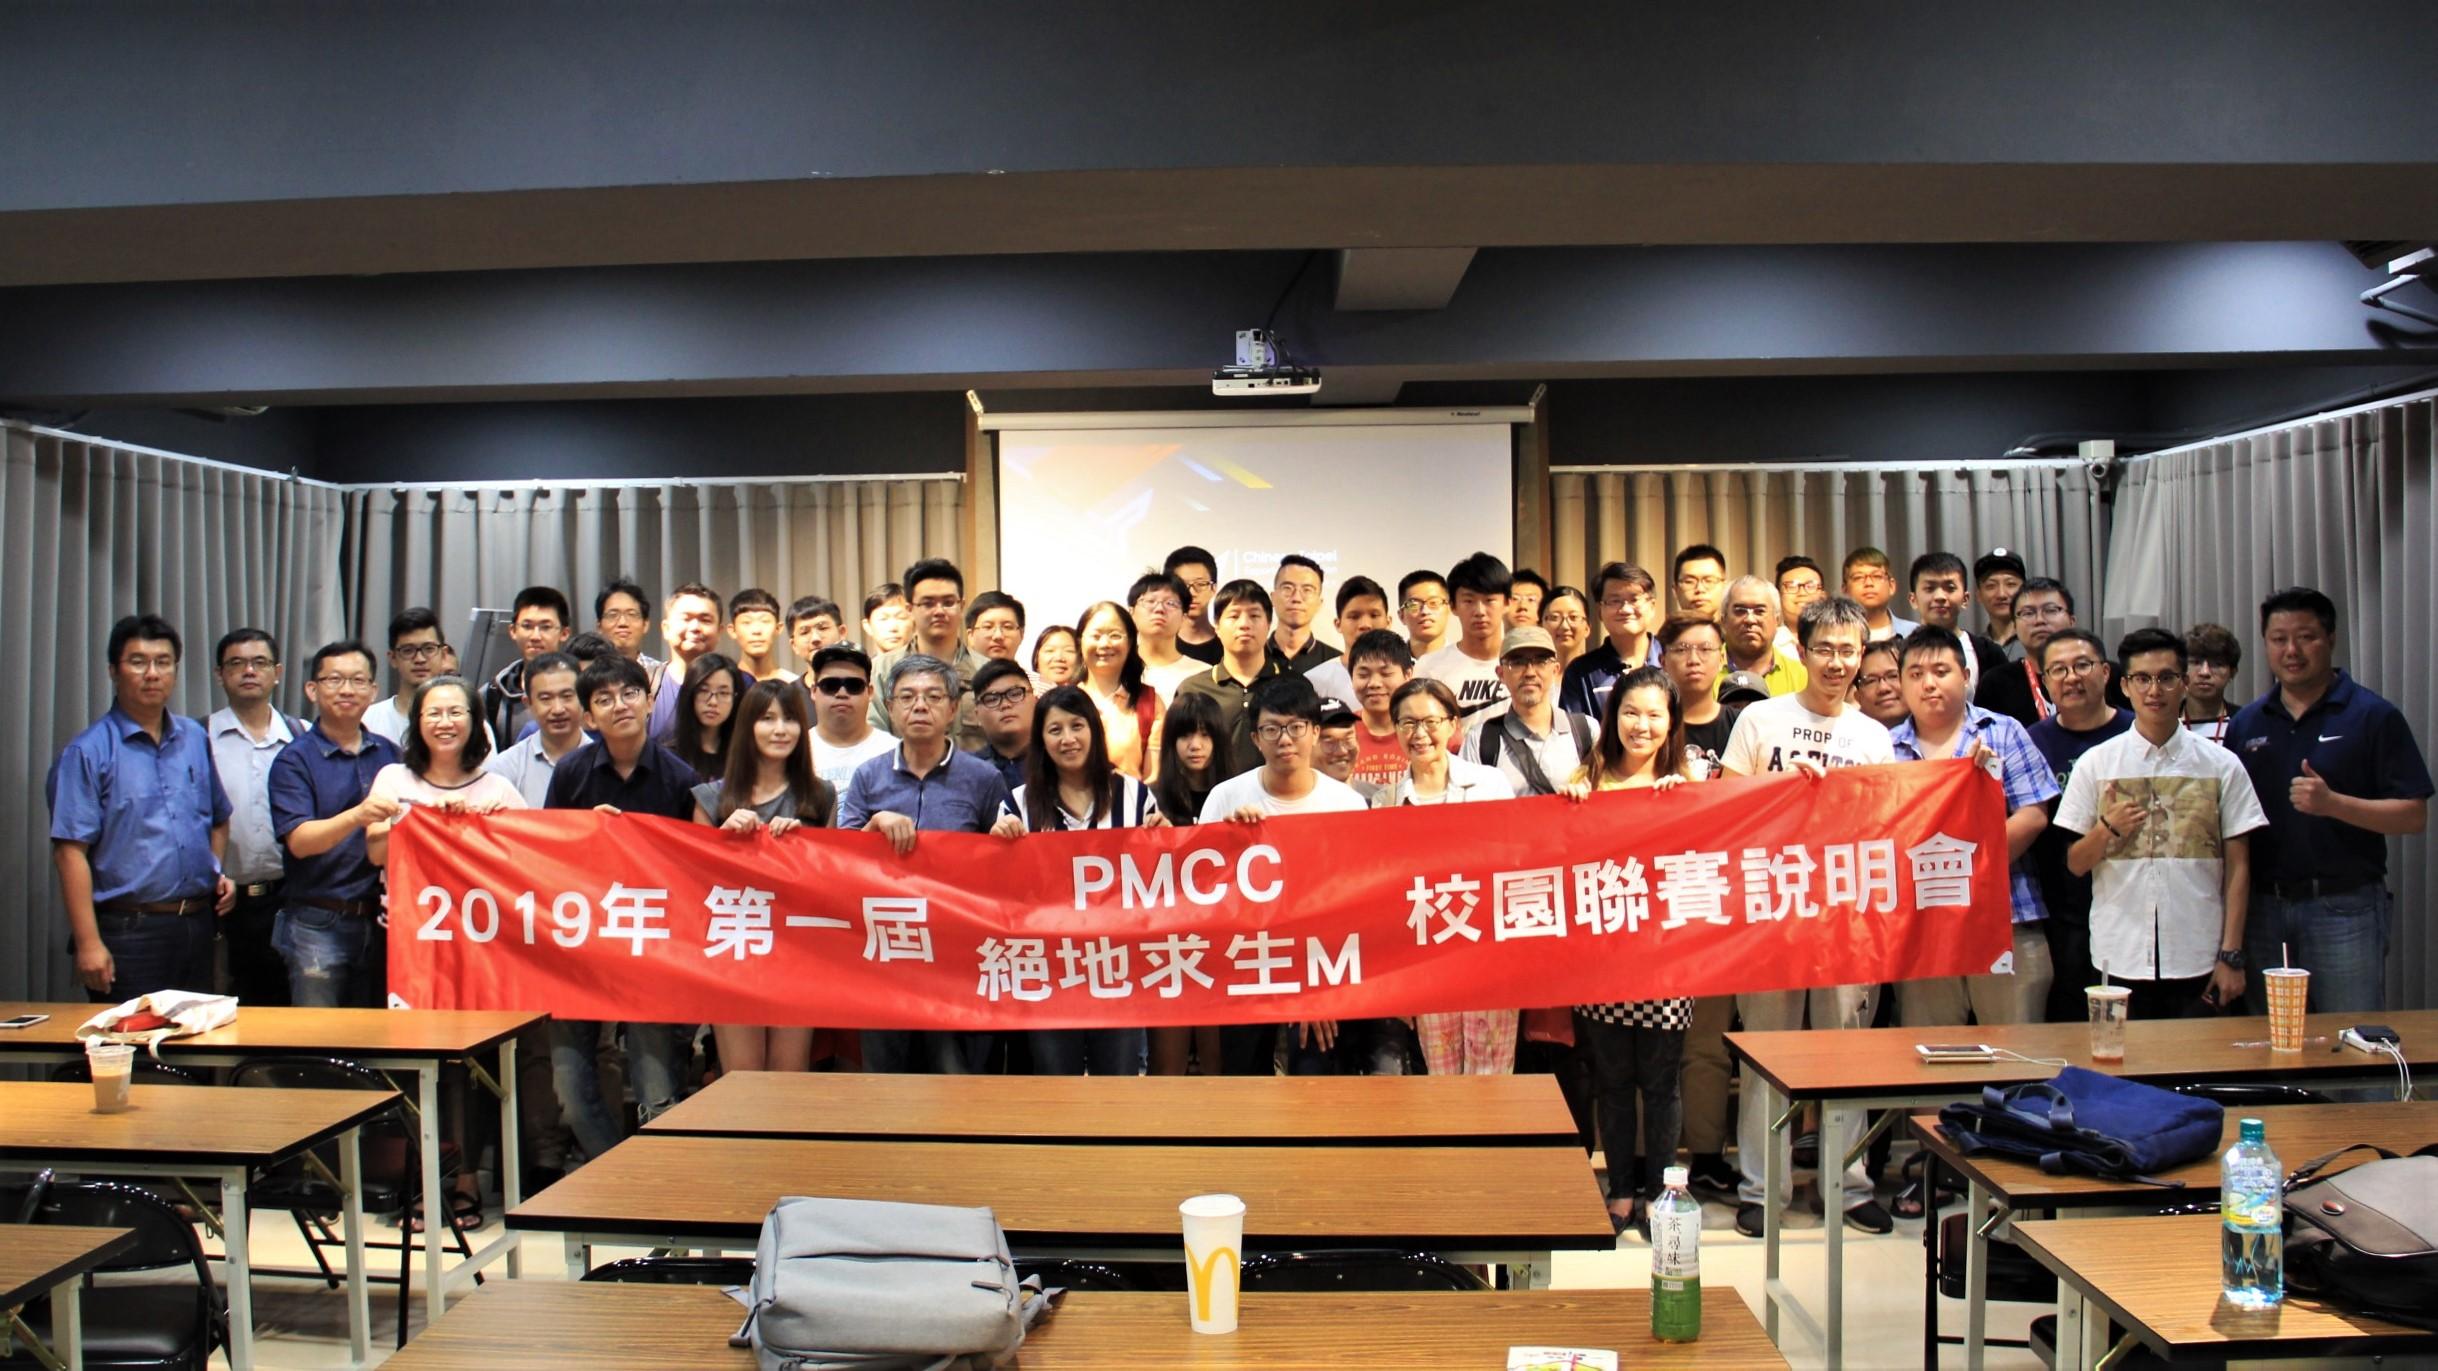 ▲PMCC《絕地求生M》校園聯賽(PUBG Mobile Campus Championship)與會師生合影